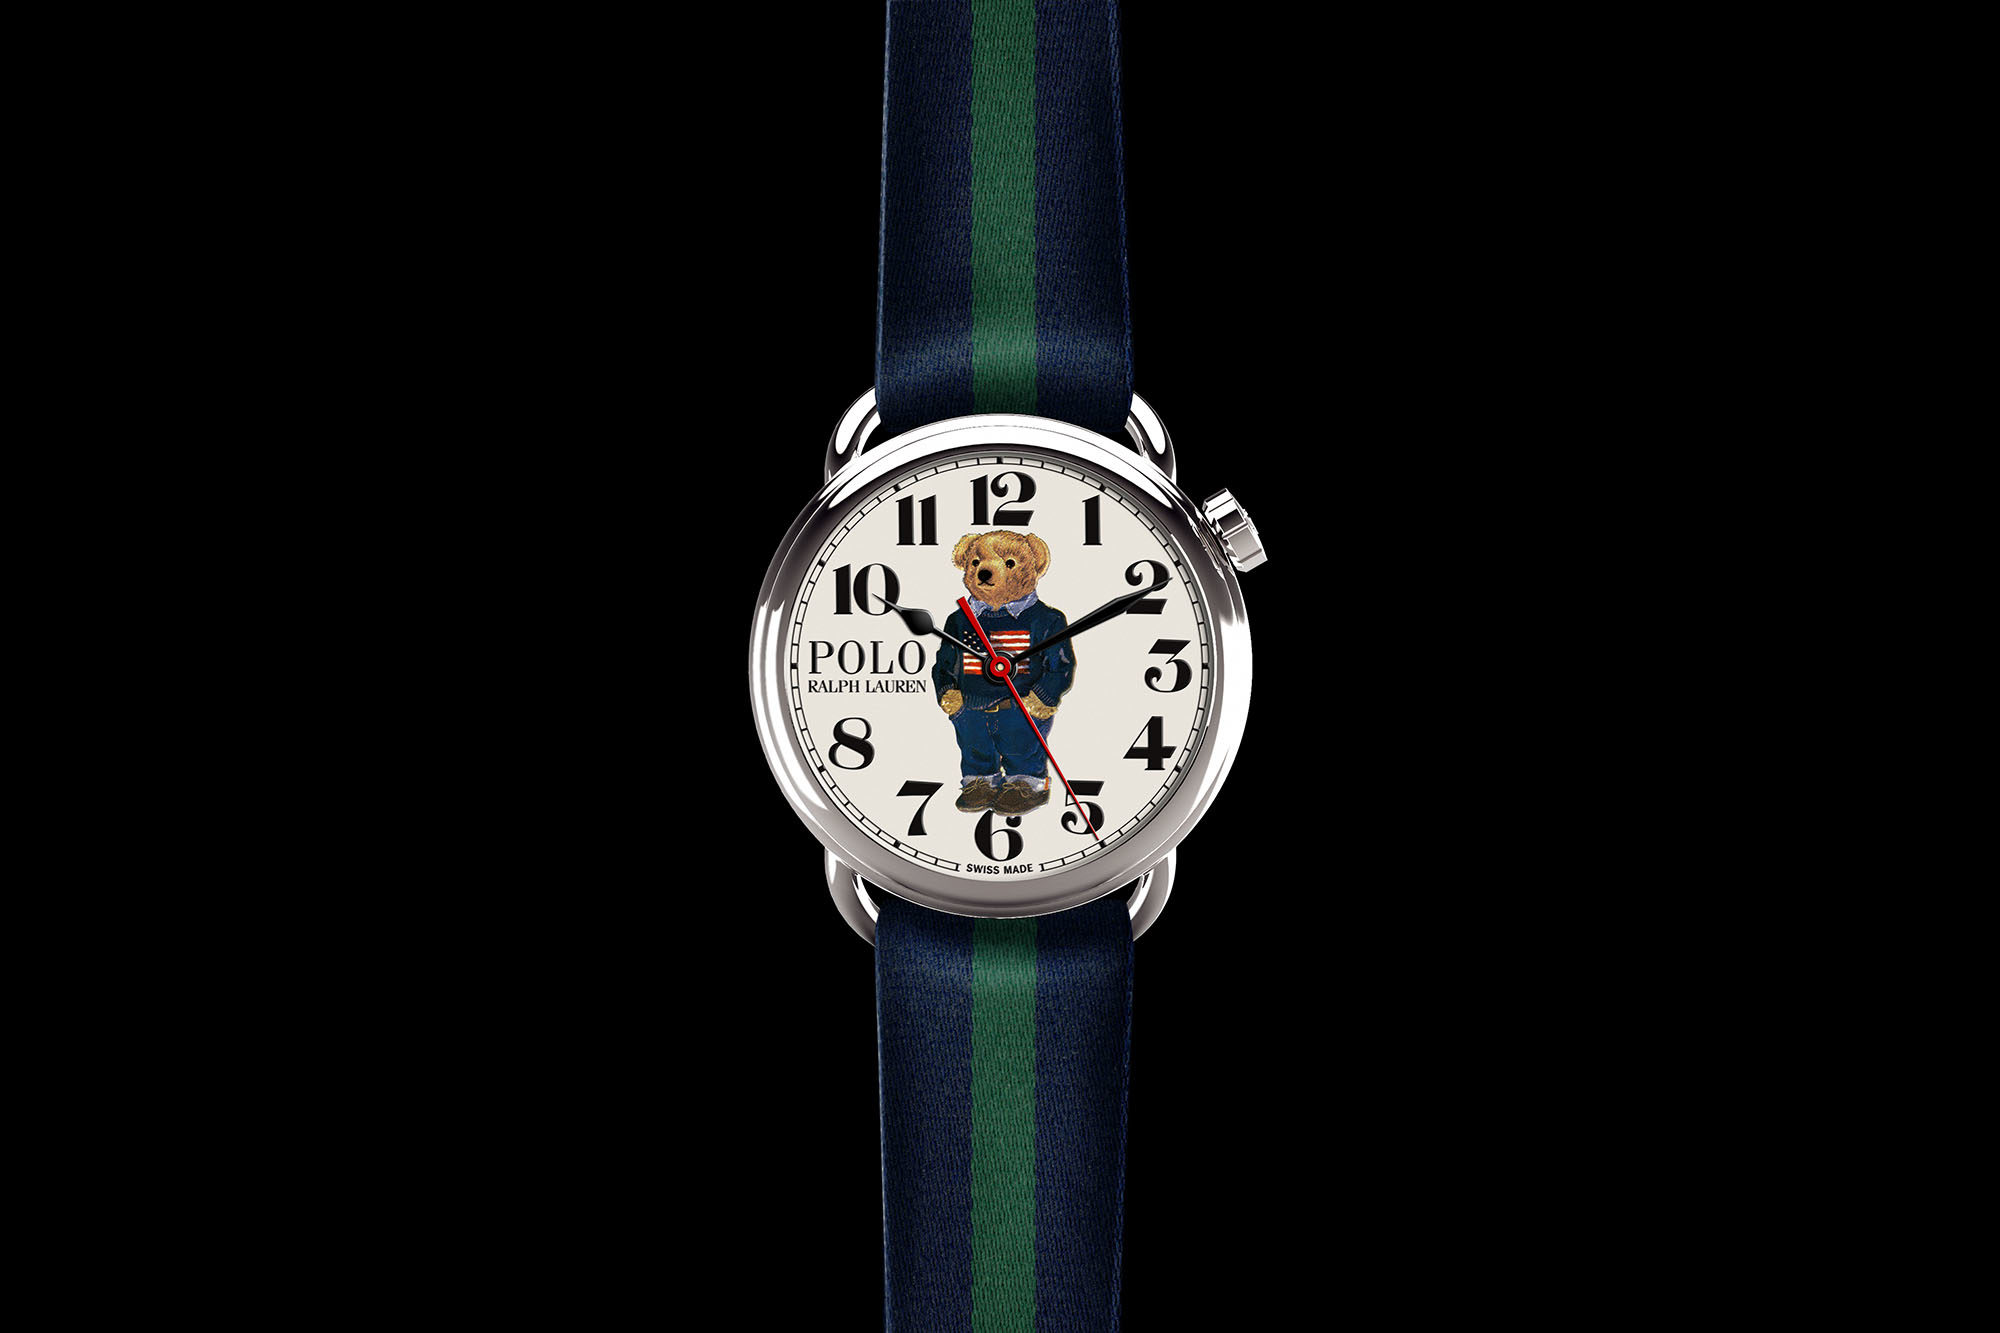 191f45eb5e5a Nouvelle collection de montres Ralph Lauren Polo Bear   Ralph Lauren